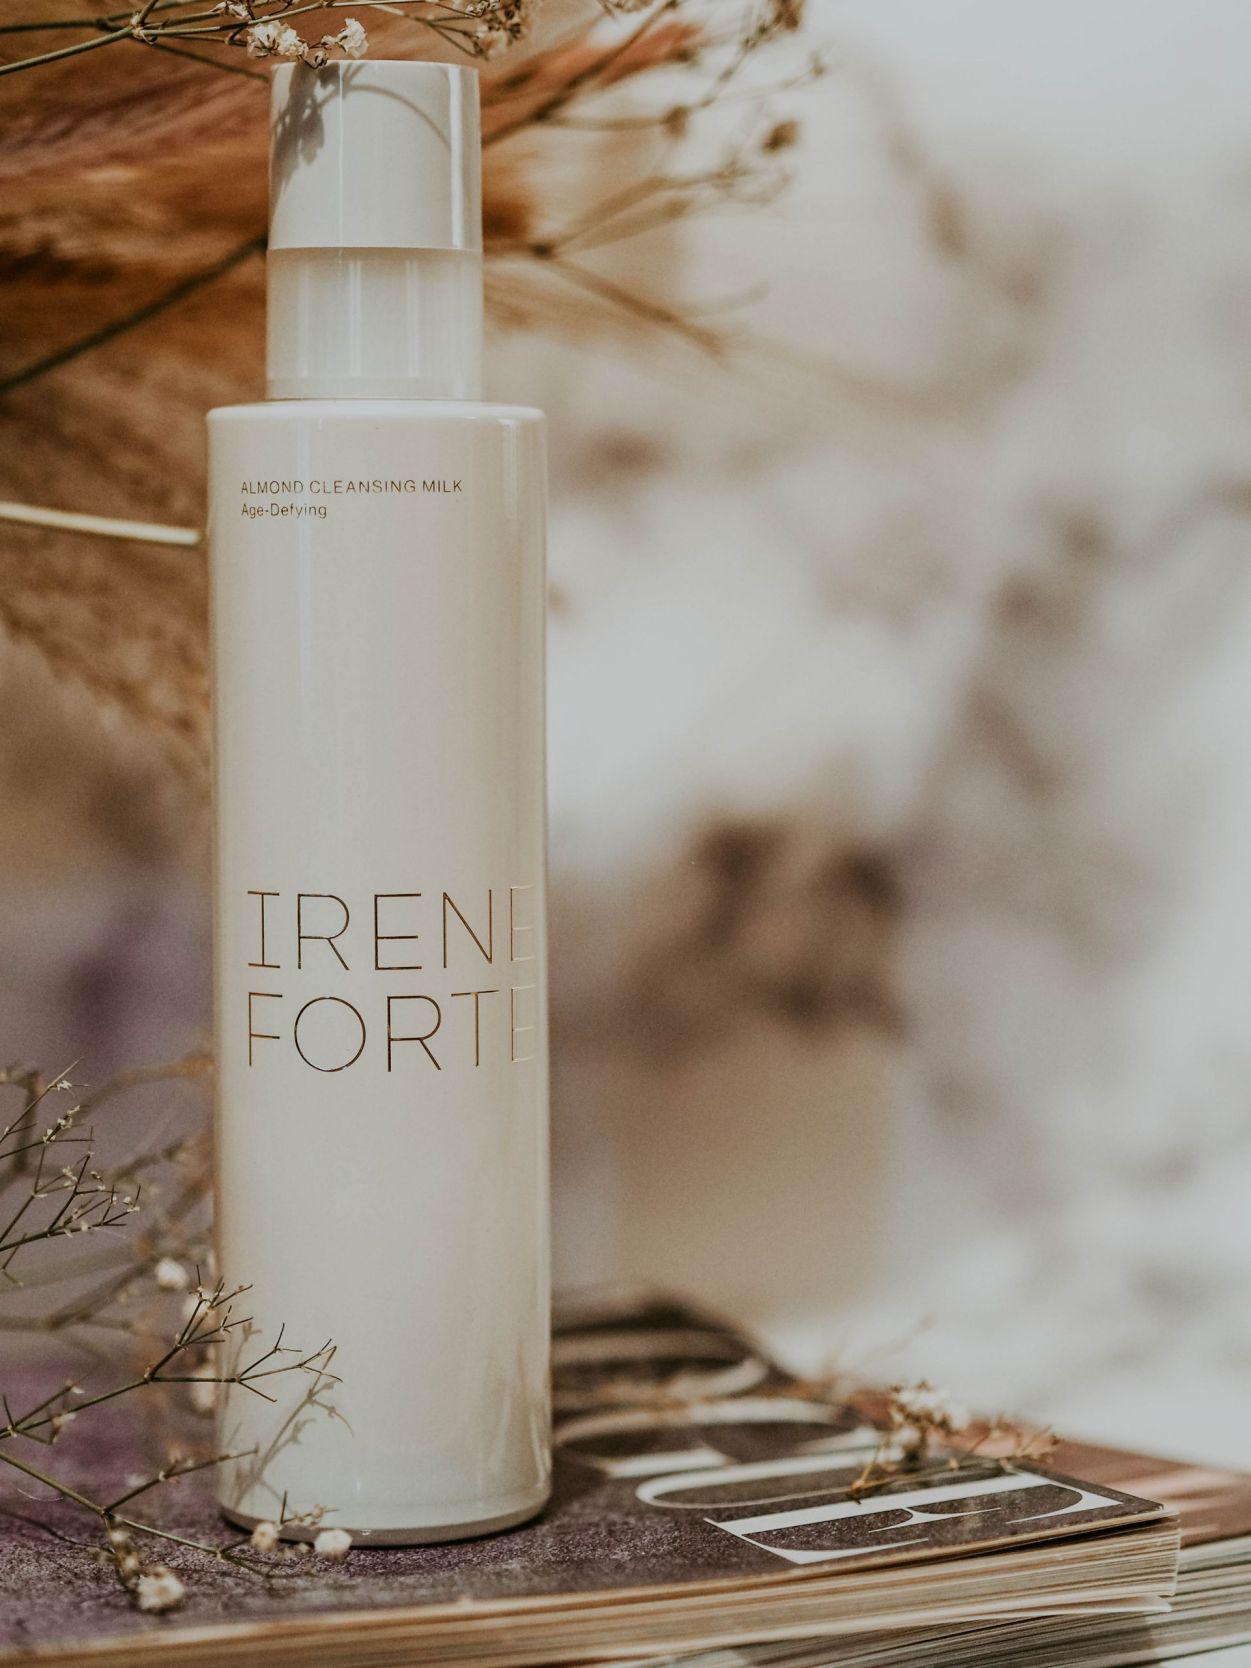 Irene Forte Skincare Review Kate Winney Almond Cleansing Milk